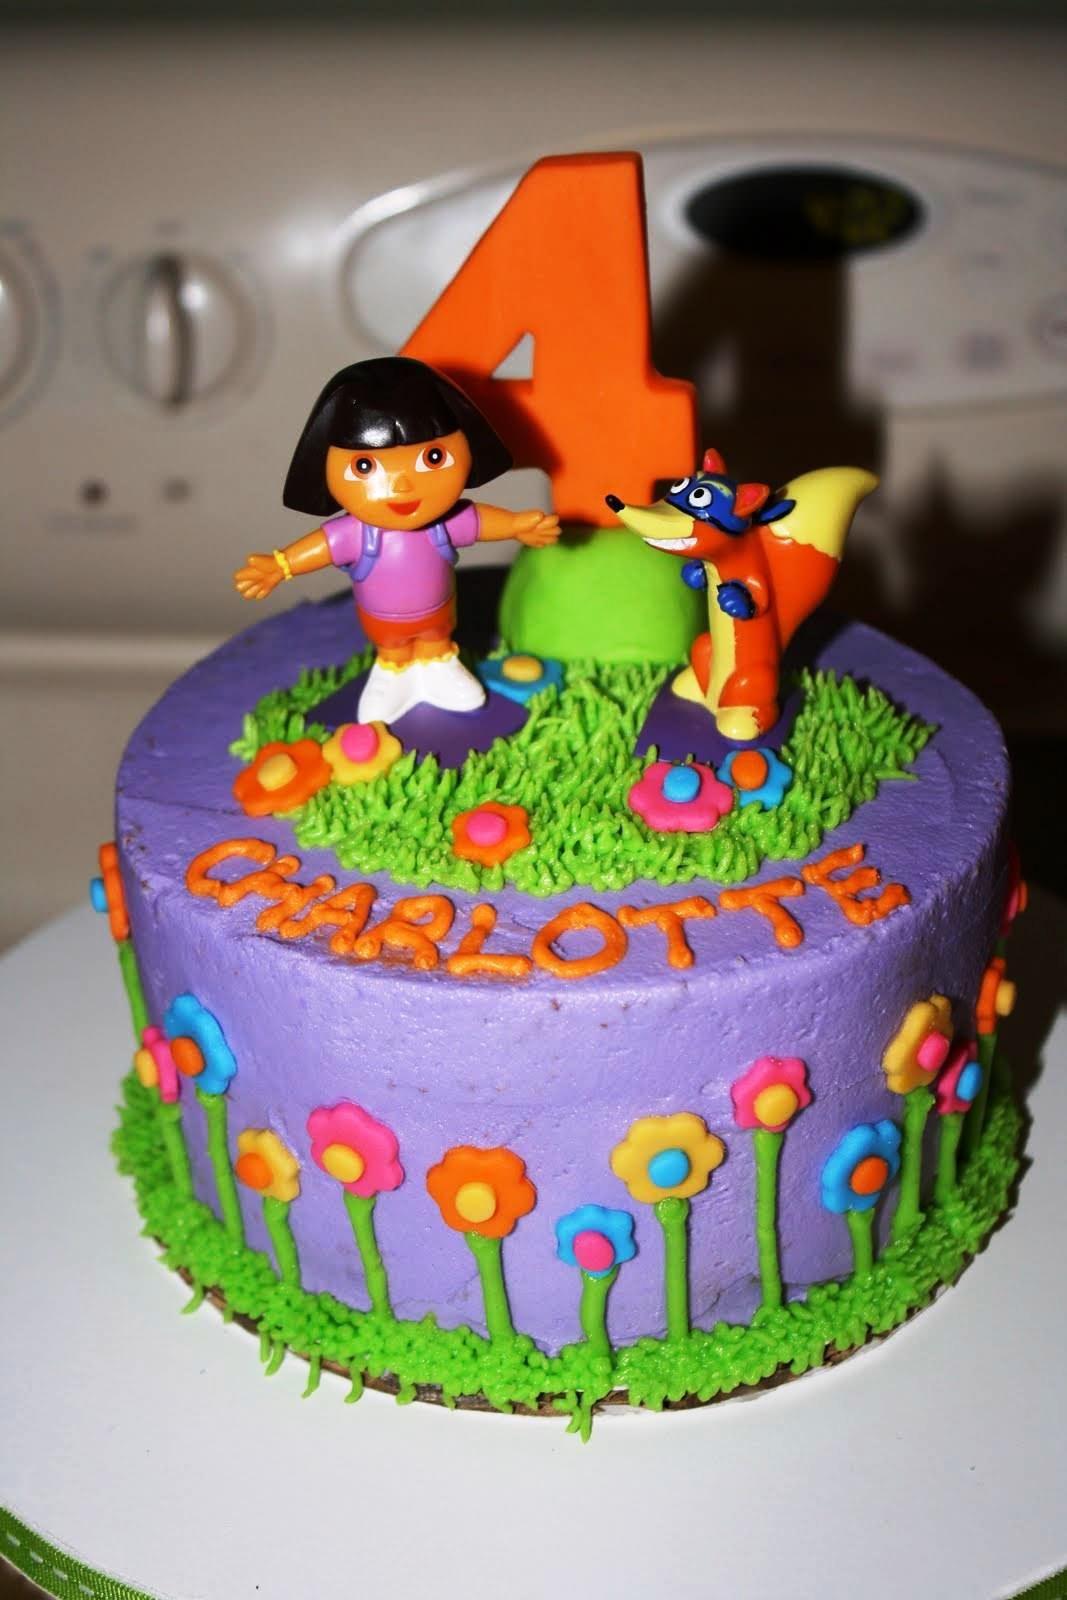 Dora Birthday Cake Images Dorcas jambo Pinterest Dora birthday